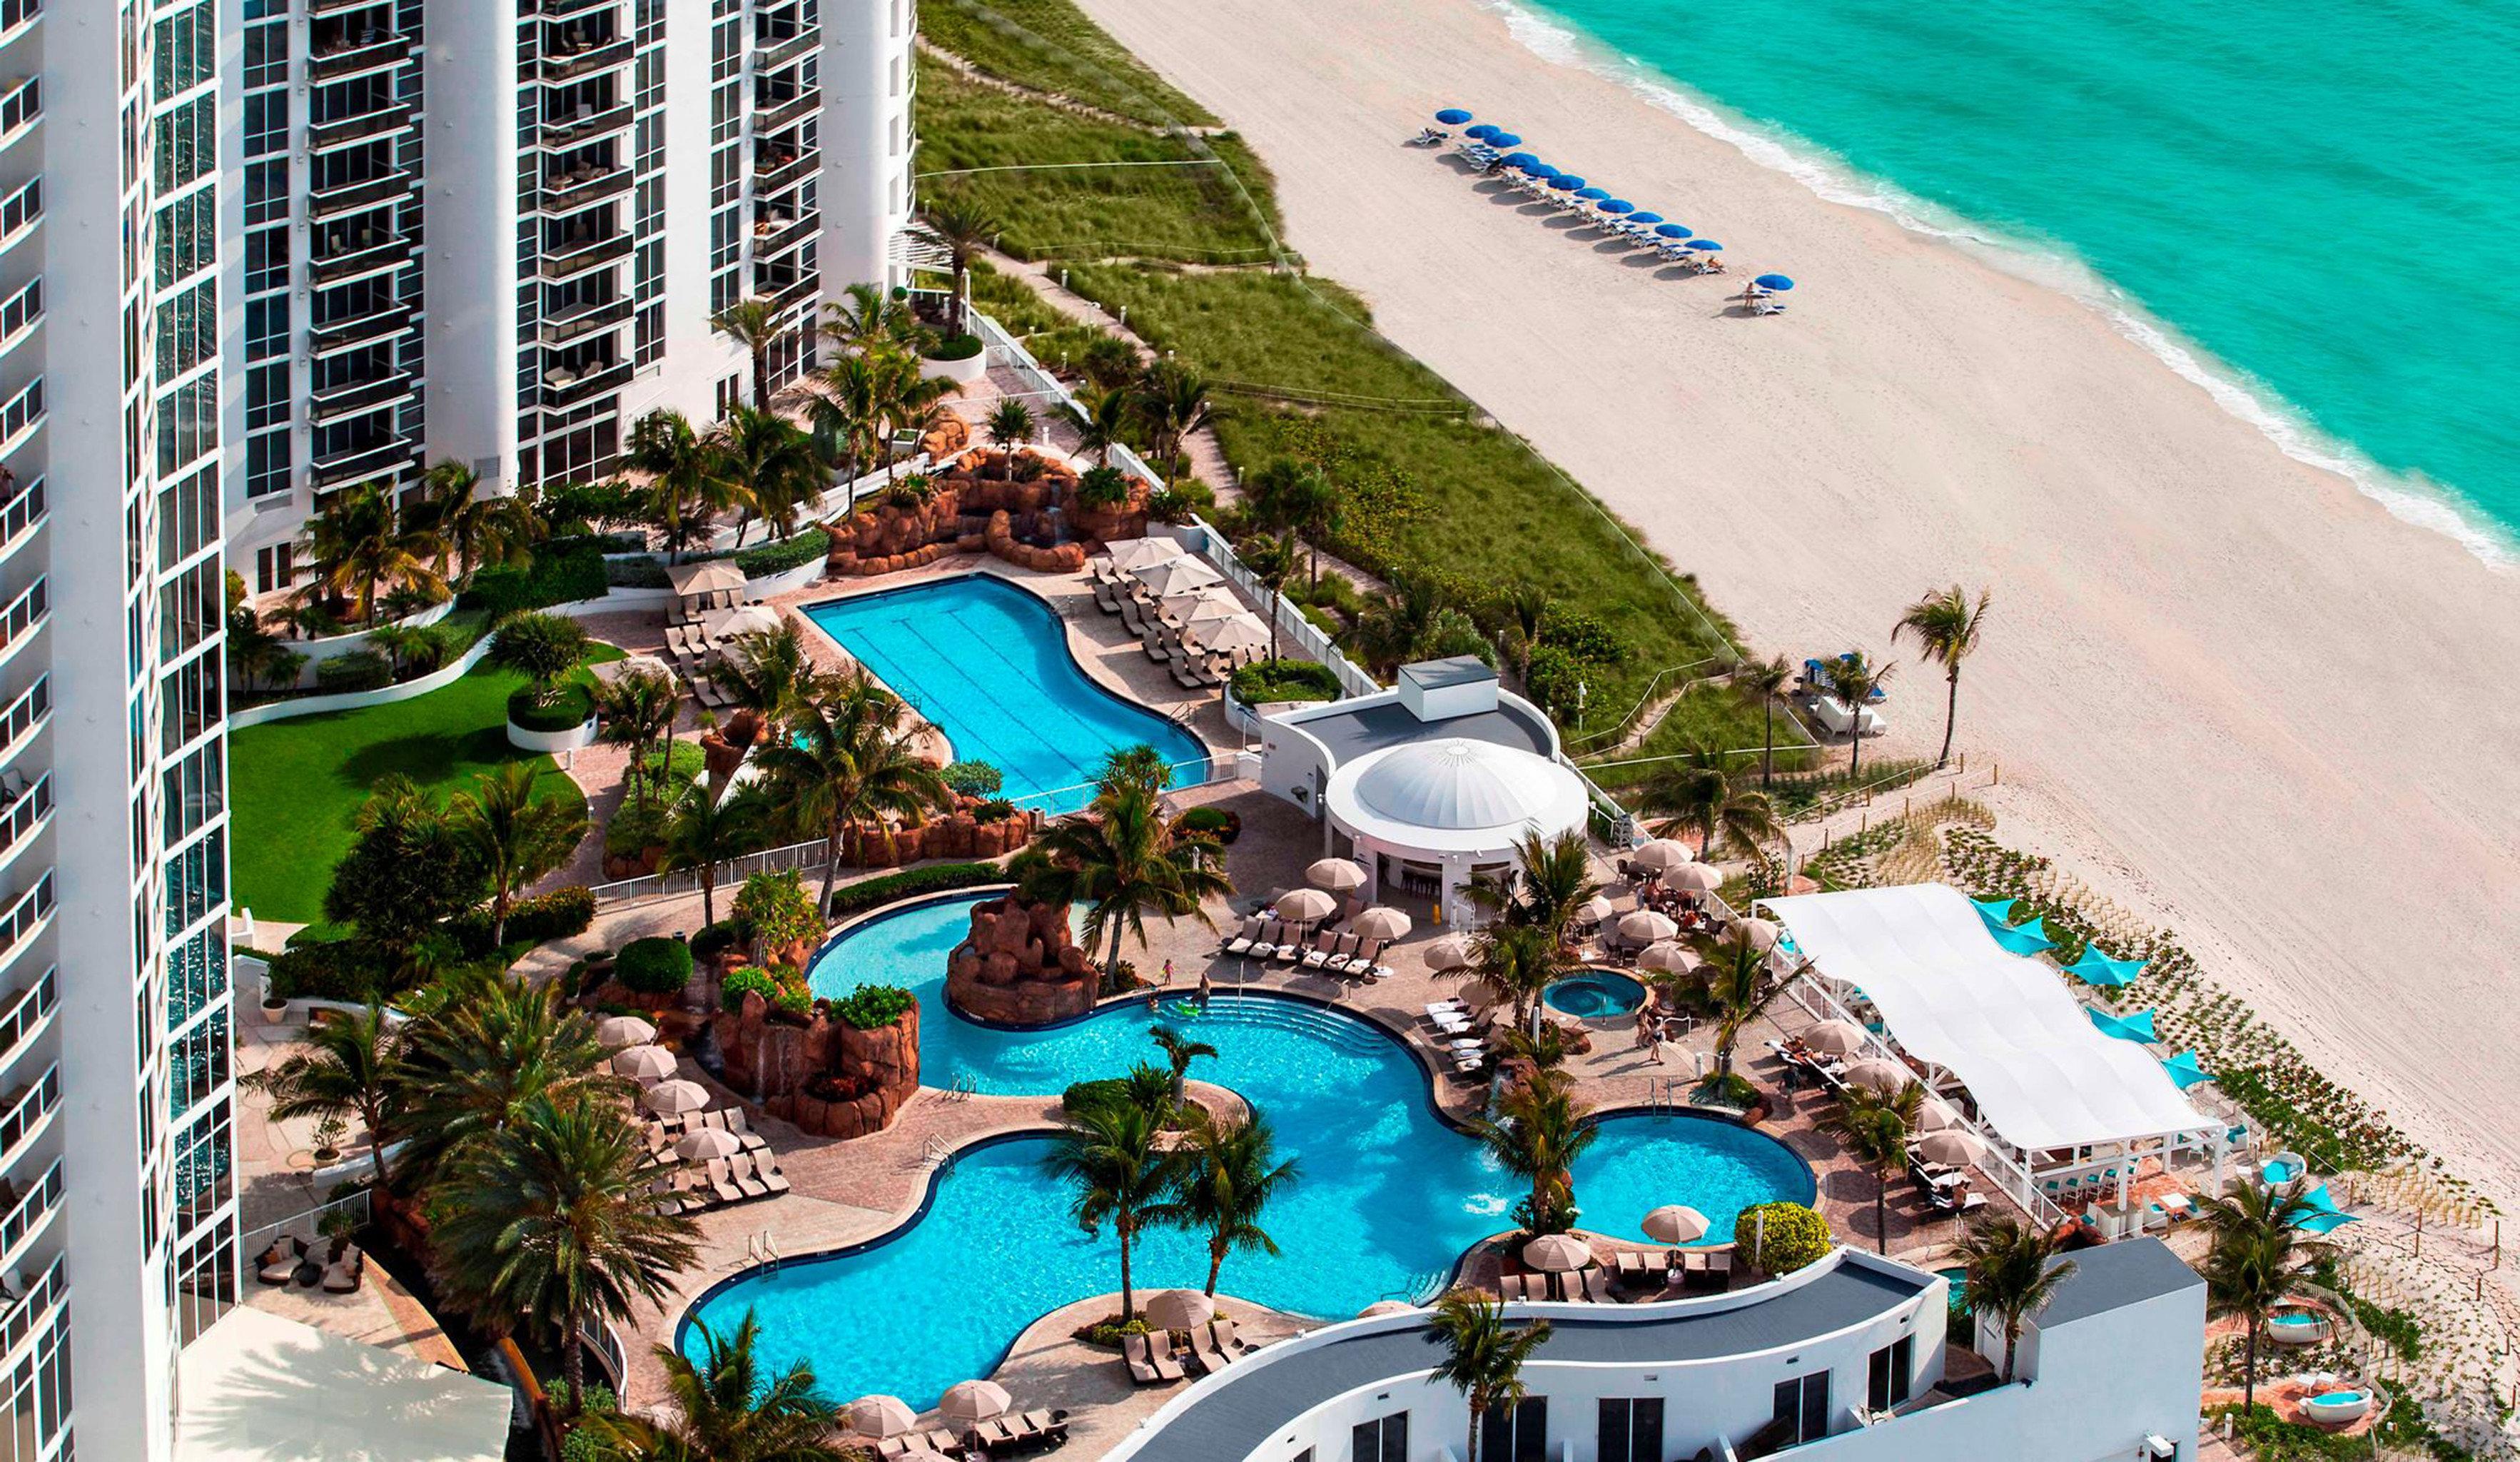 leisure amusement park Water park Resort park aerial photography swimming pool outdoor recreation marina